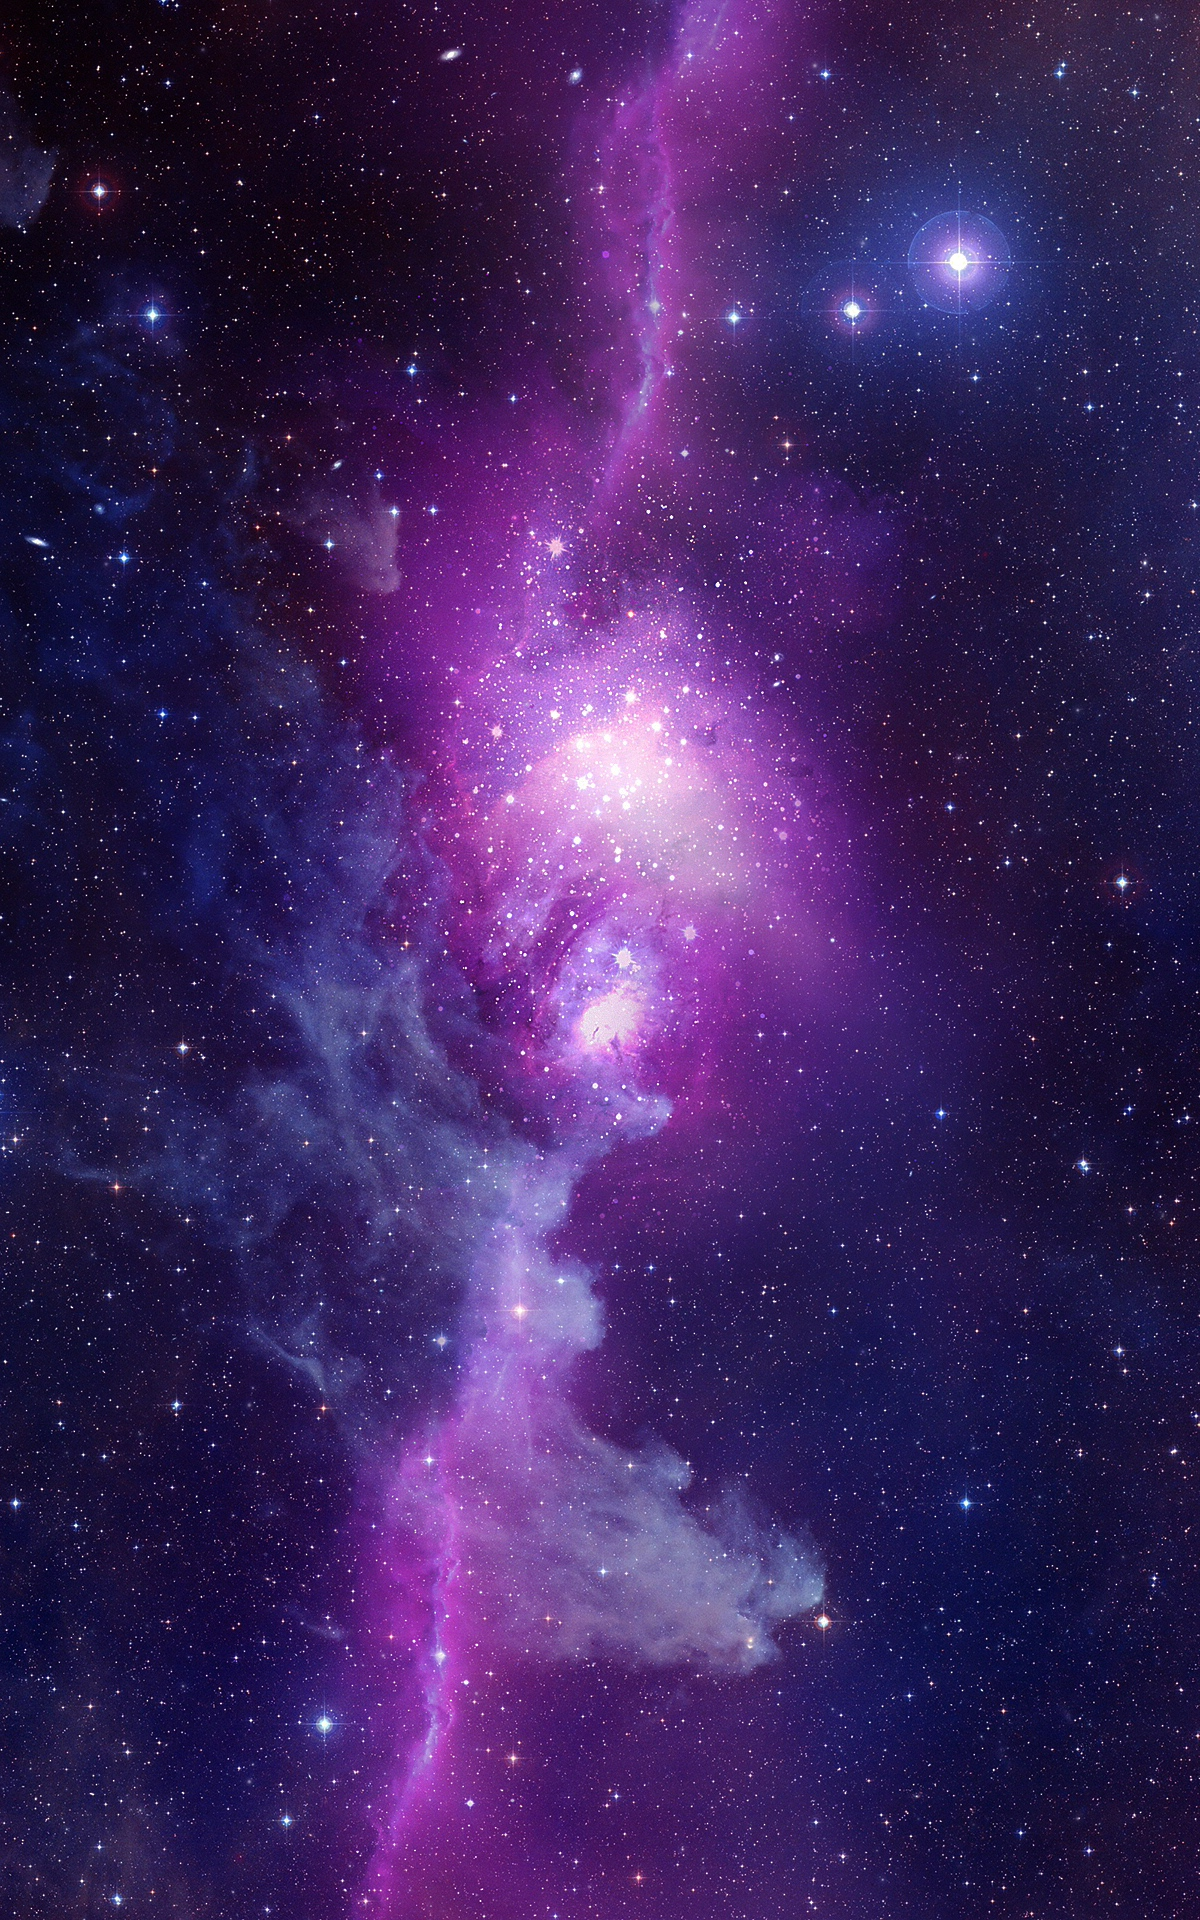 purple orange space galaxy painting - photo #15